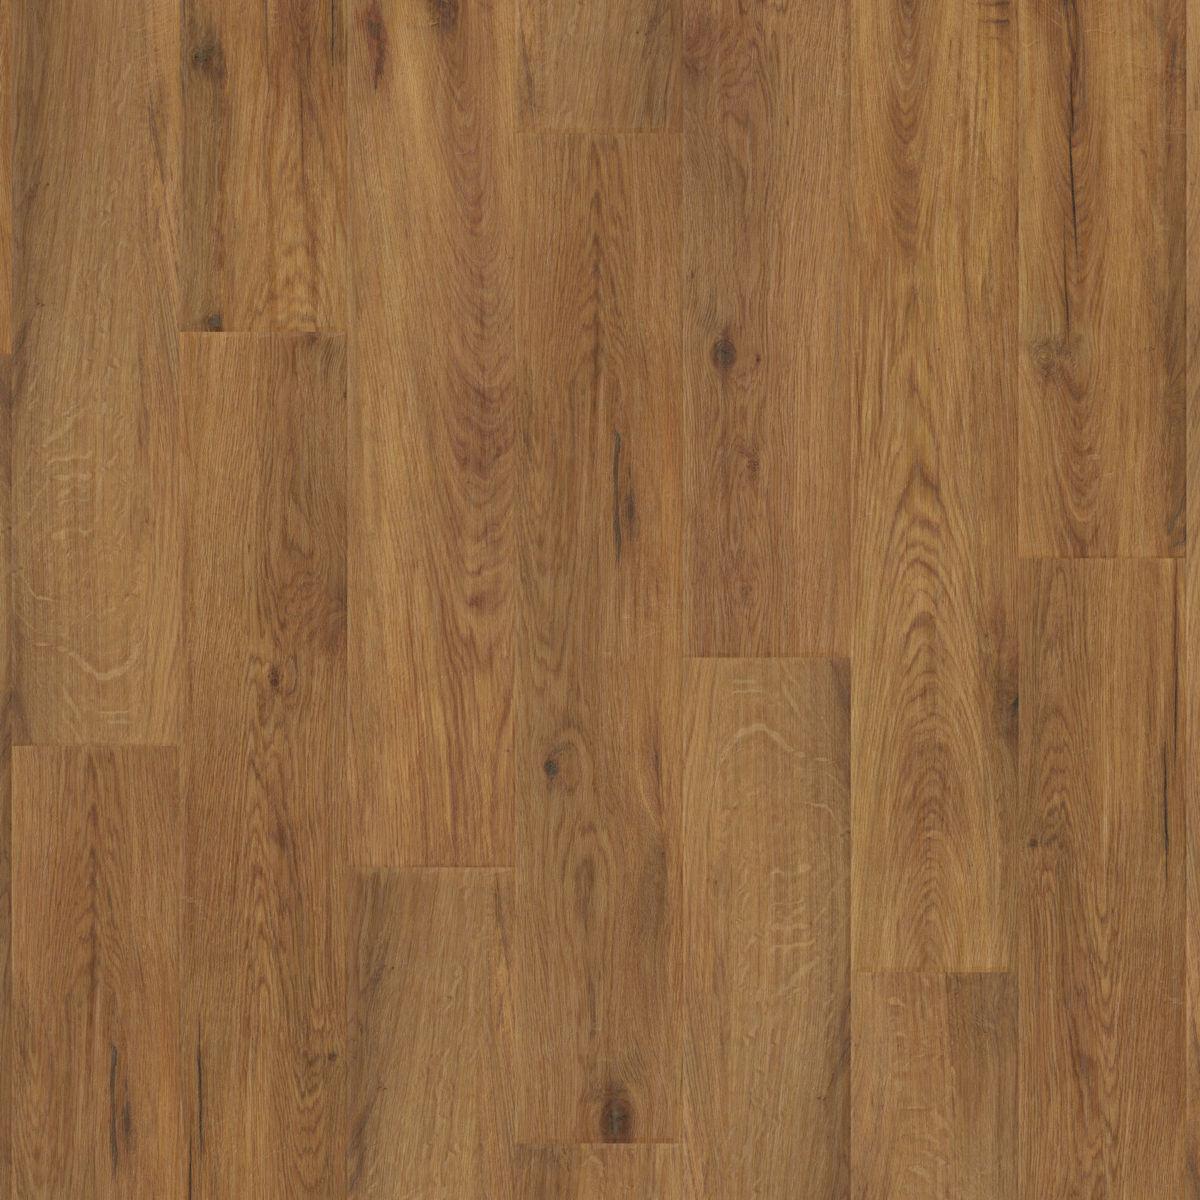 Wood Laminate Flooring Reviews Karndean Art Select Morning Oak Hc02 Vinyl Flooring